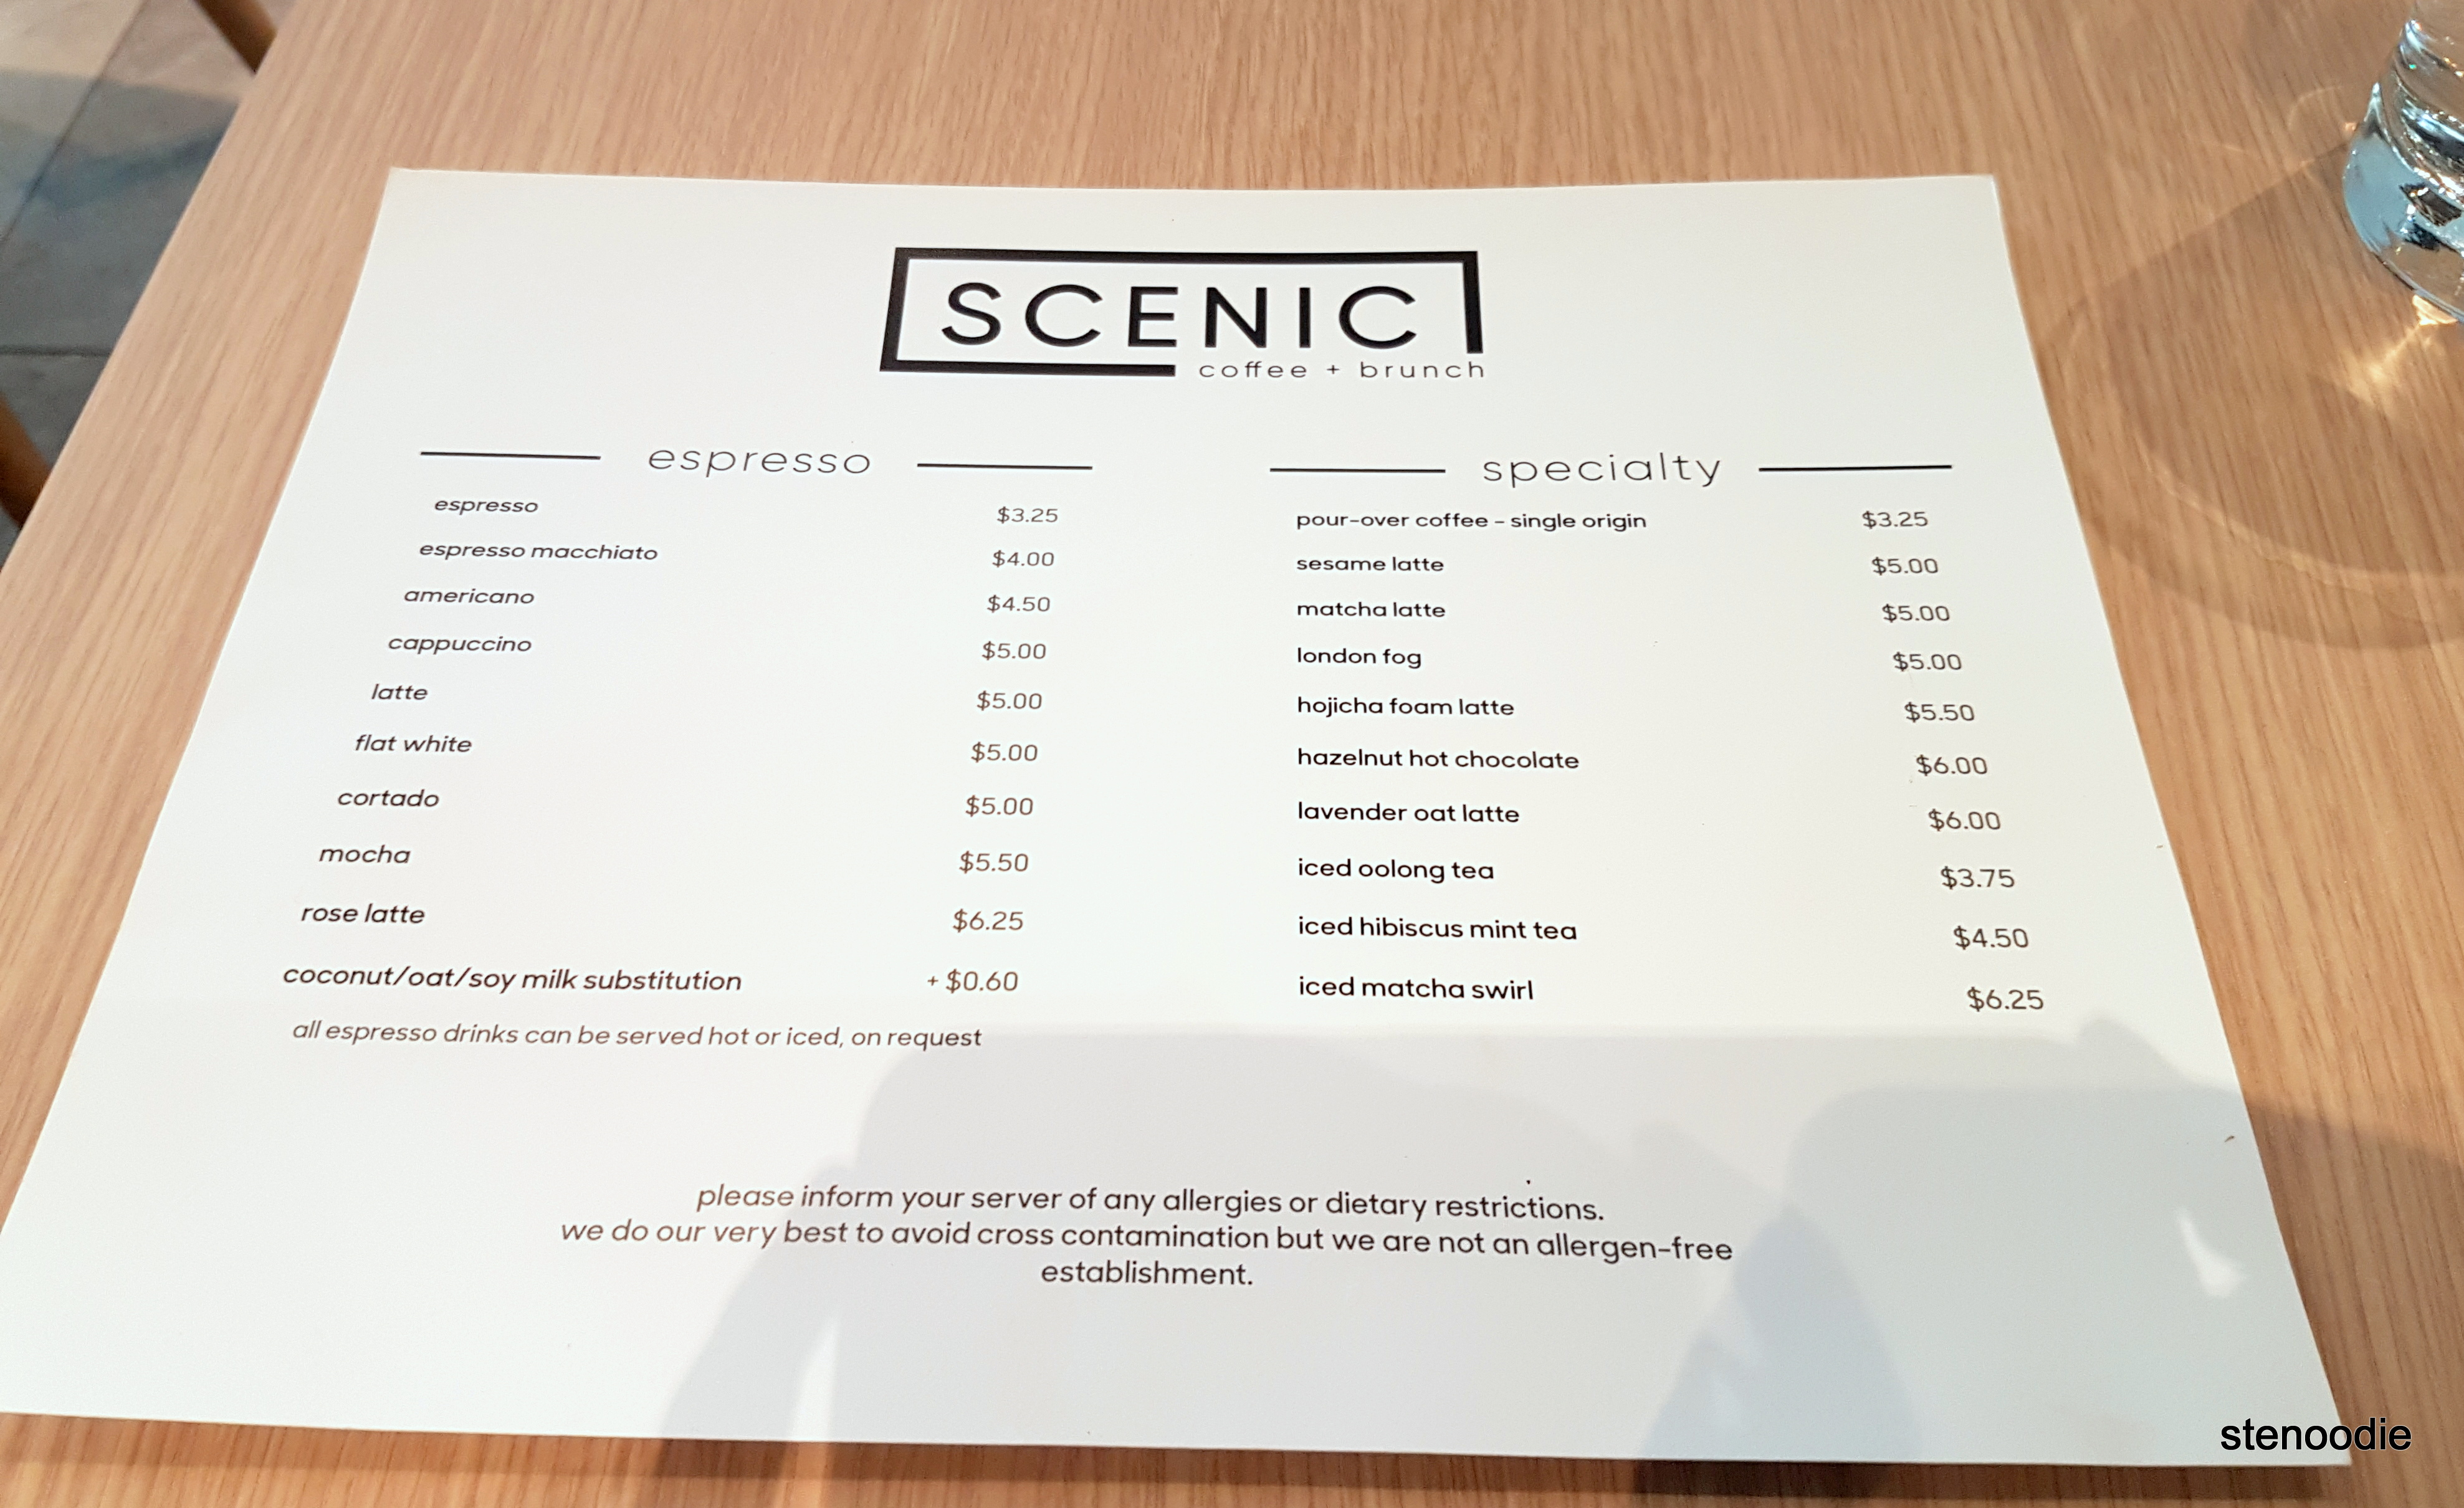 SCENIC coffee + brunch drinks menu